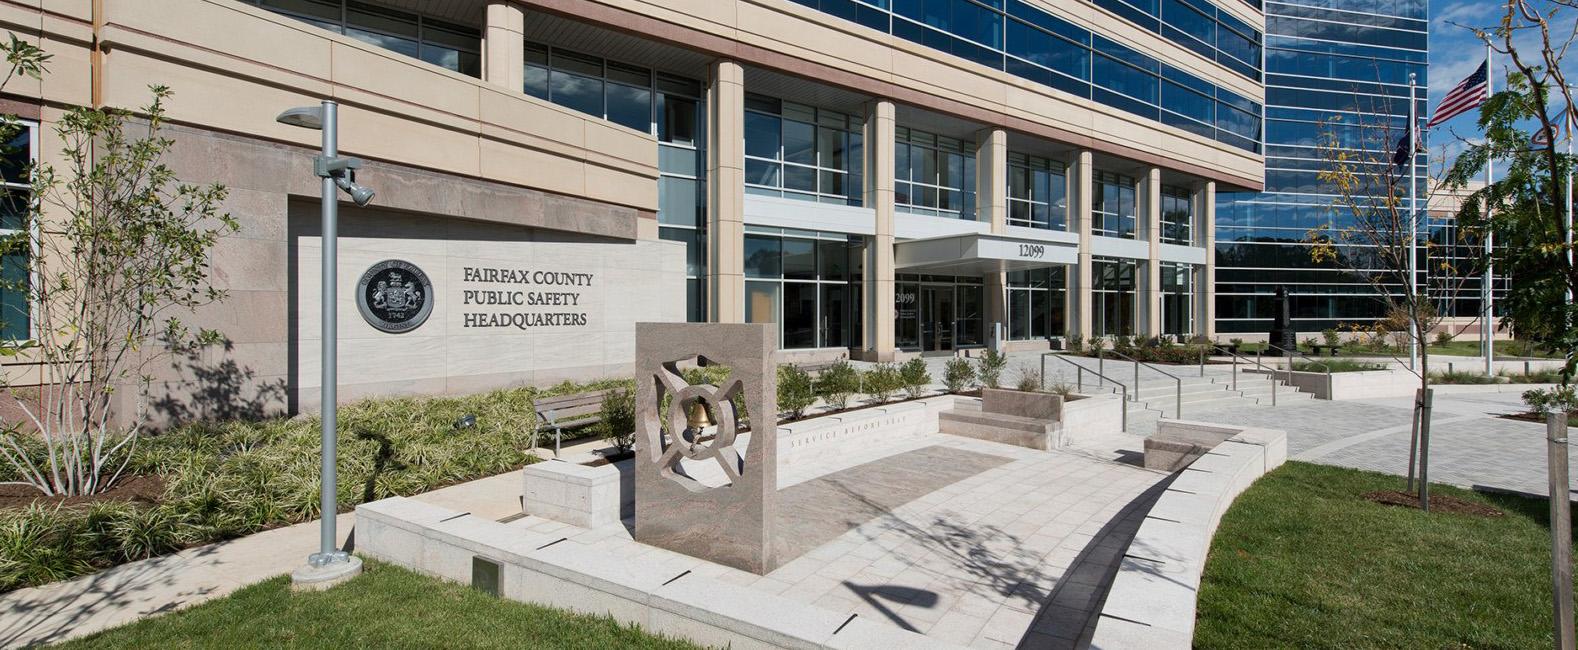 Fairfax VA Police_Public Safety HQ_1800